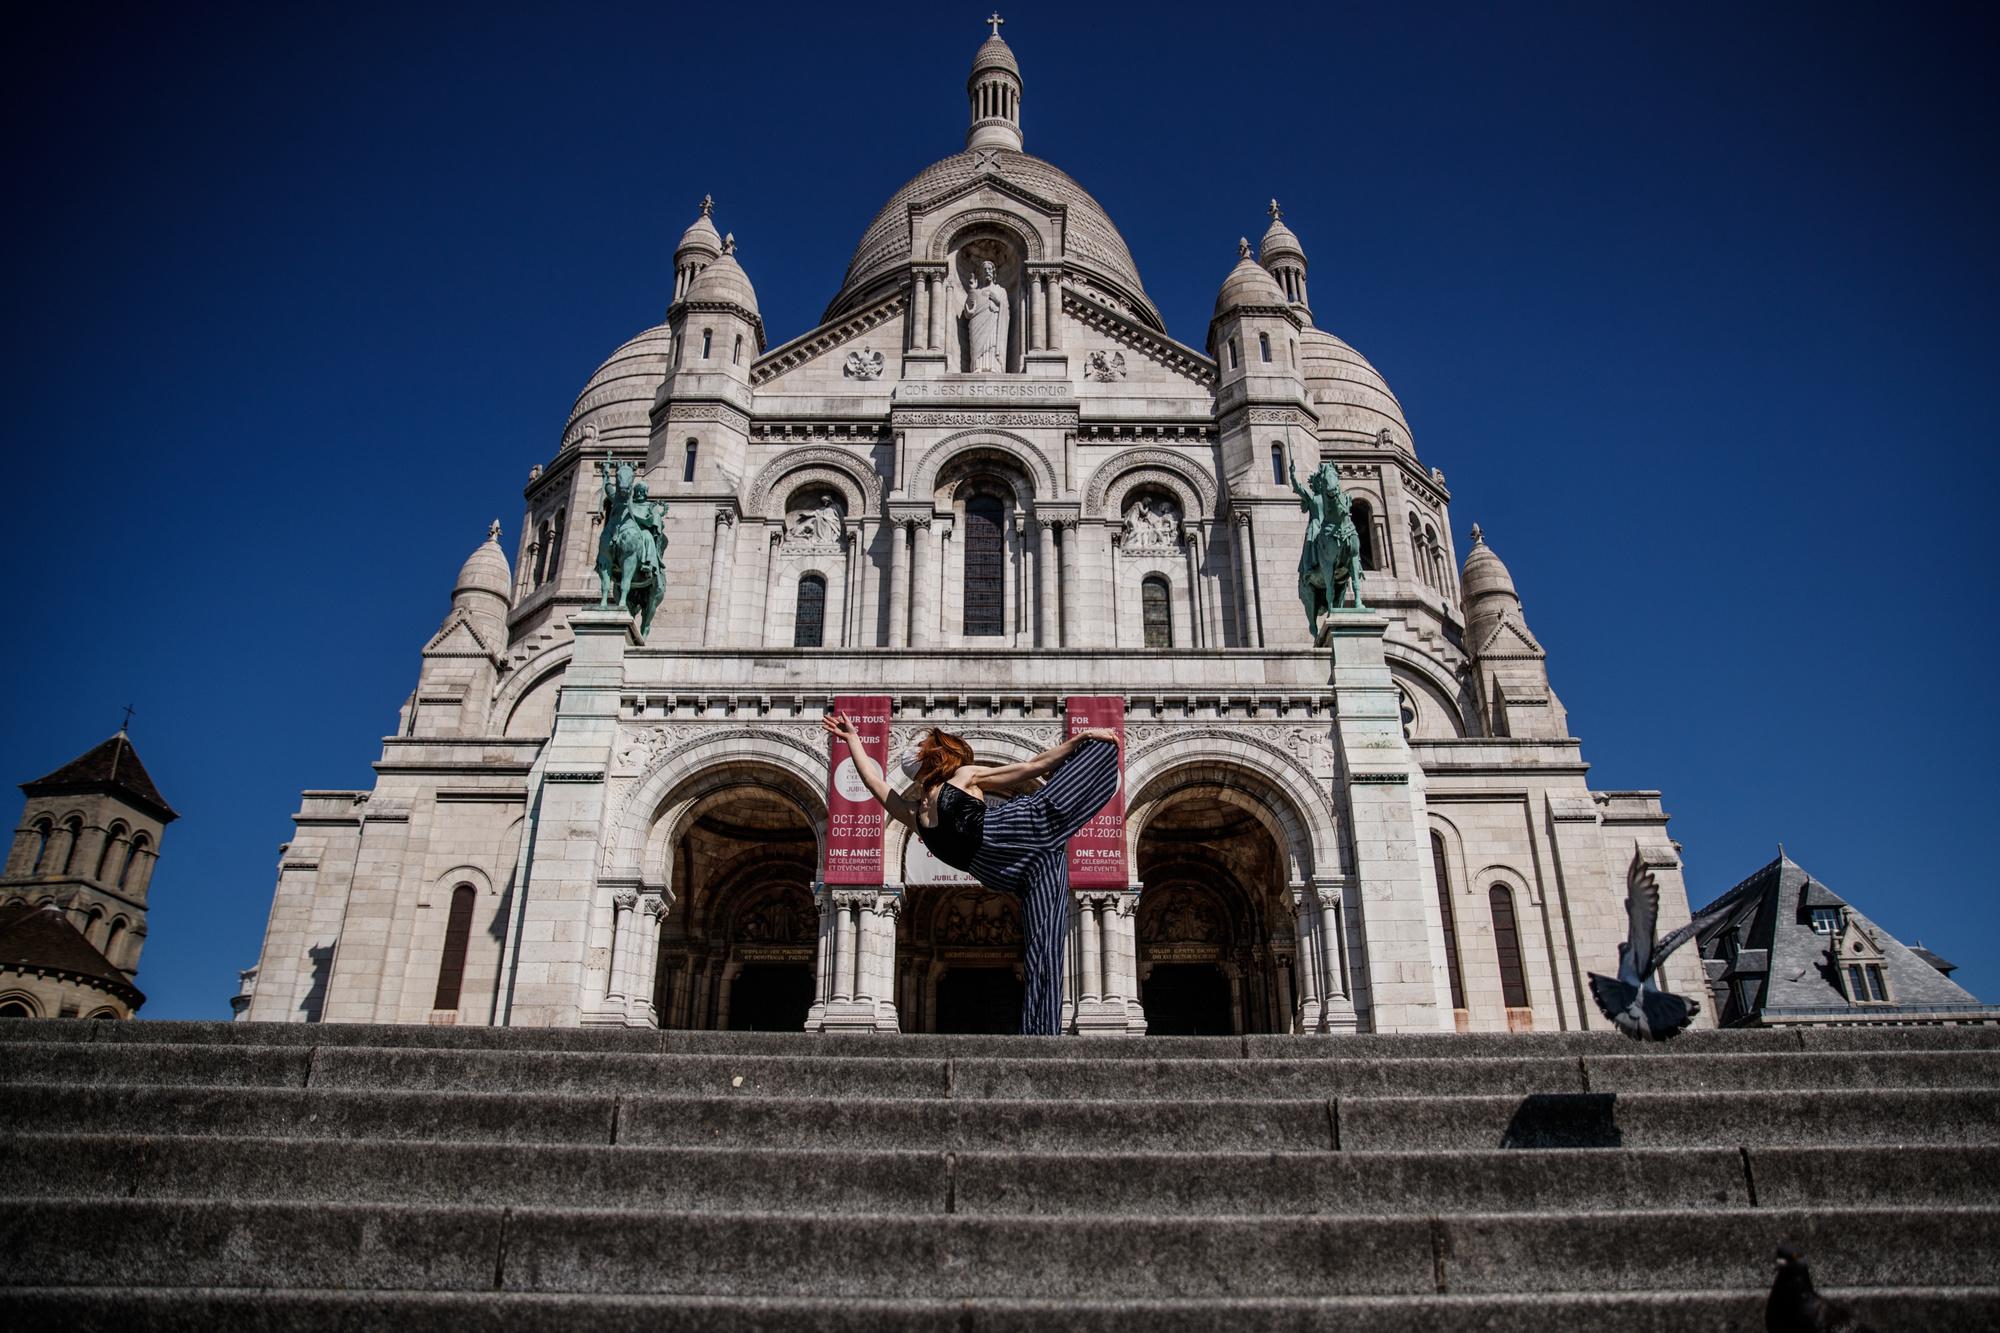 Yara al-Hasbani devant le Sacré Coeur, belga